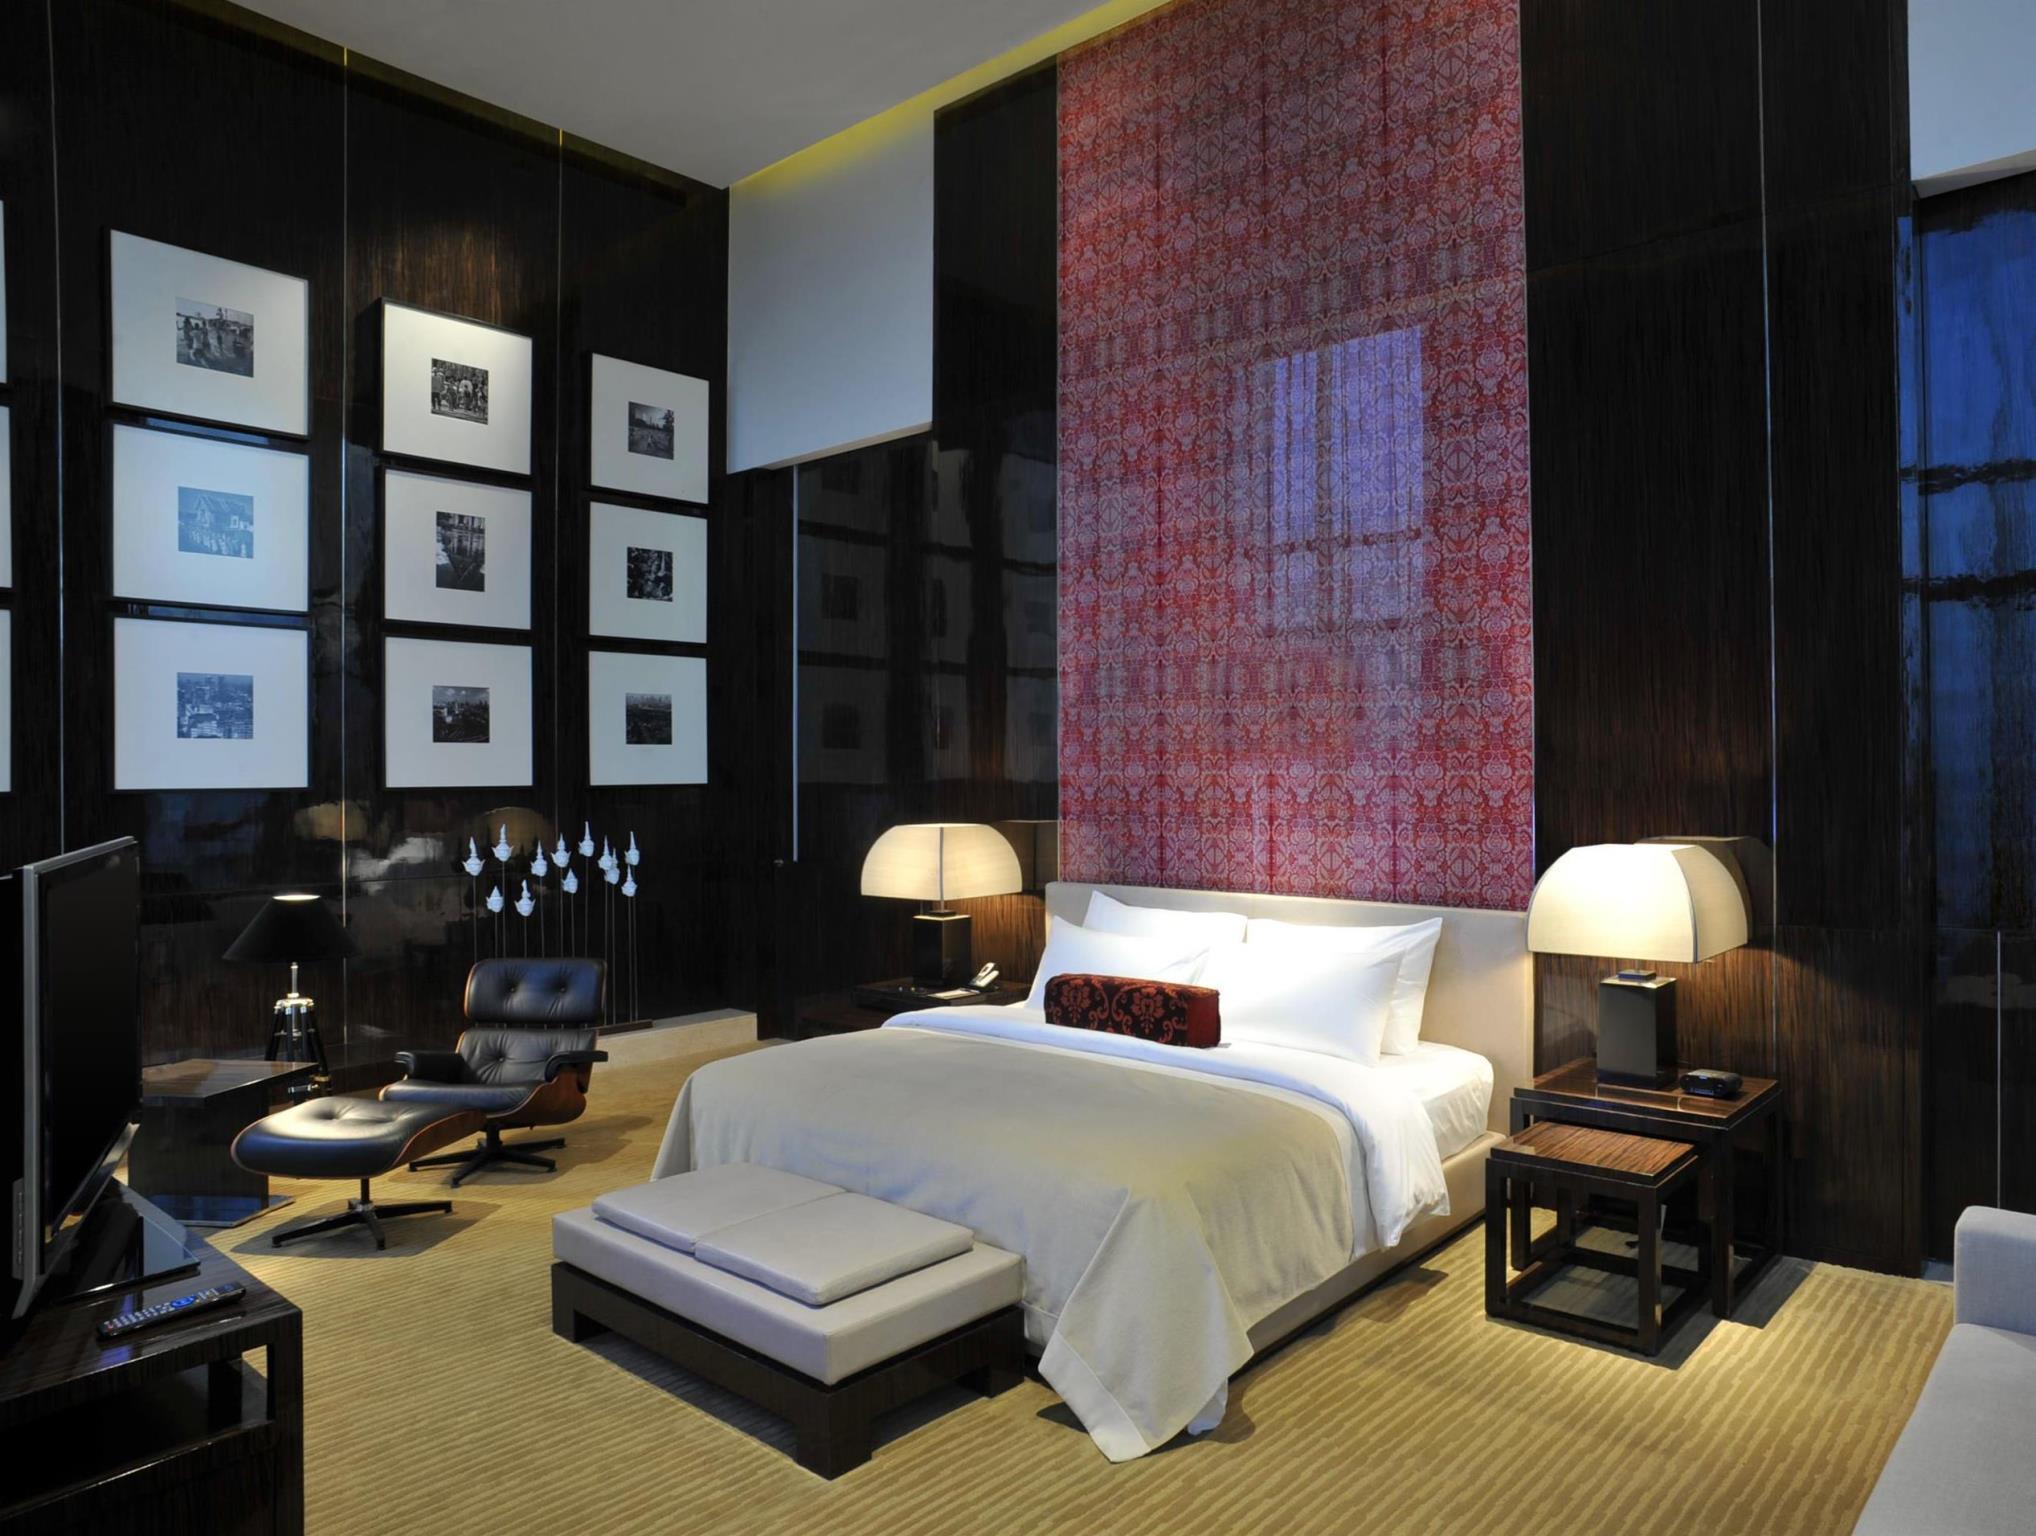 Le Meridien Bangkok Hotel - Bangkok